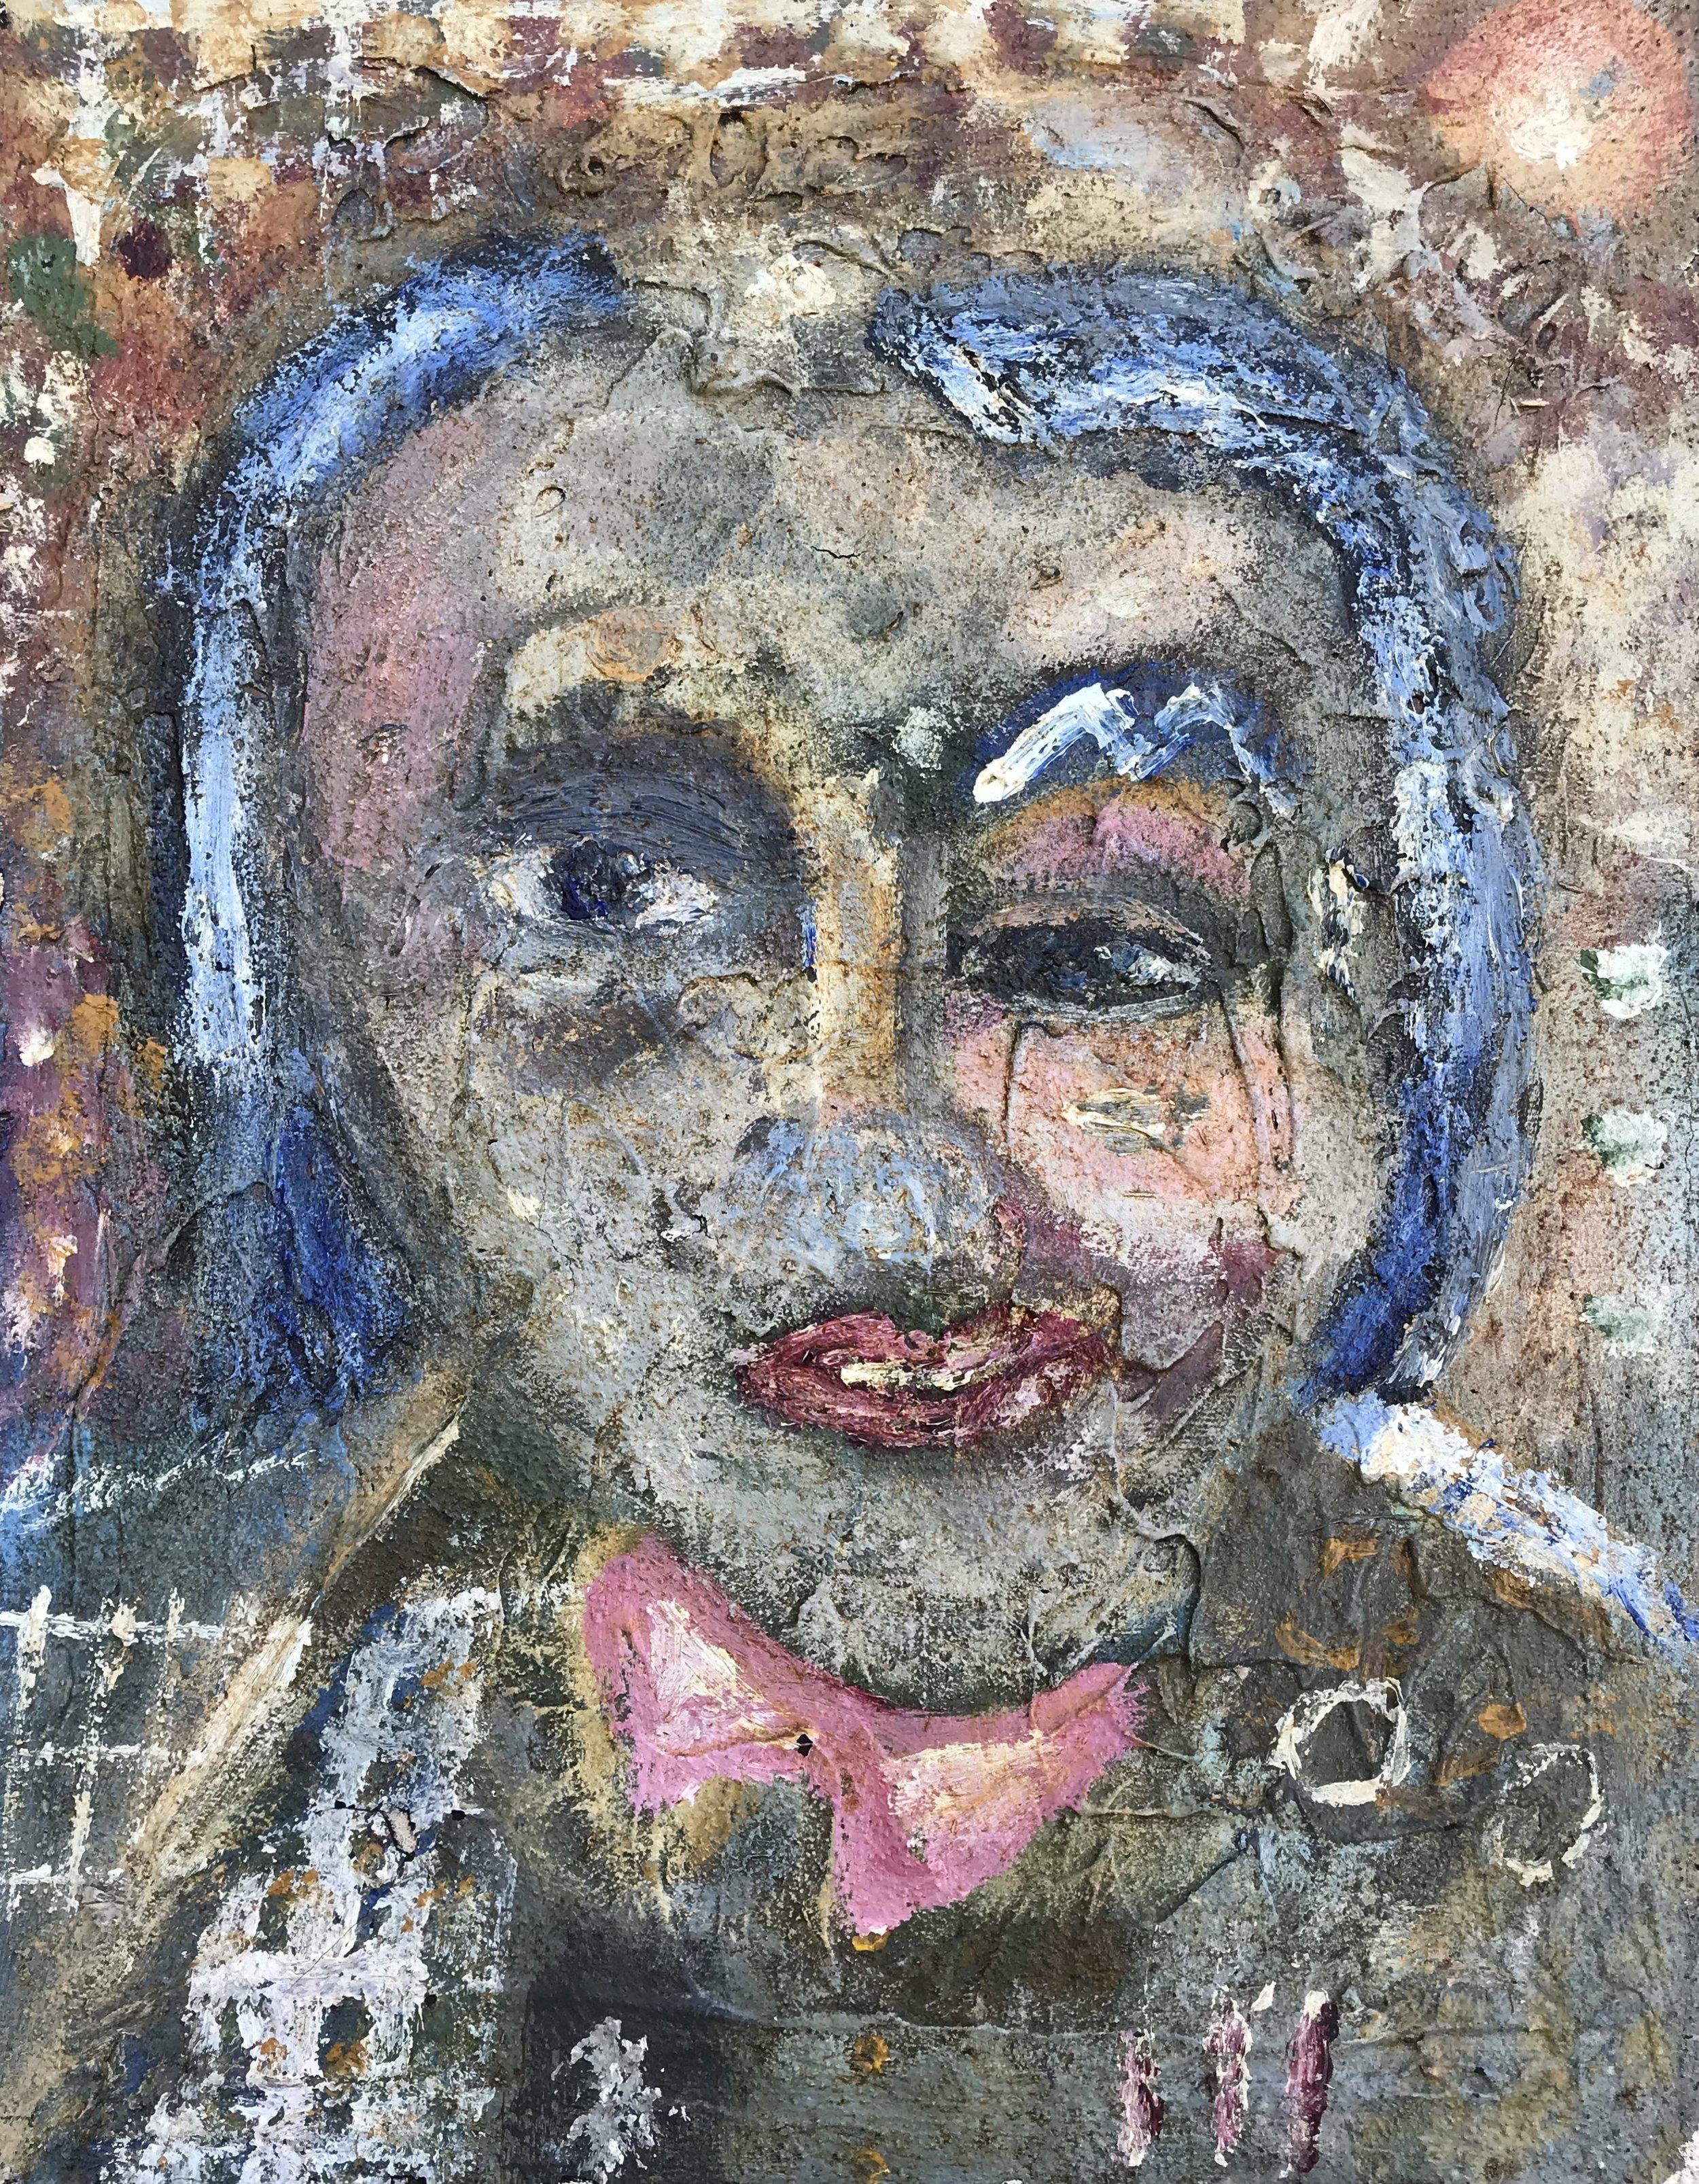 """Bobby Blue Eyes"" - 14"" x 11"" x 3/4"", mixed media on canvasValue: $1,000Opening bid: $400email your bid to: art@bradfordbrenner.com"